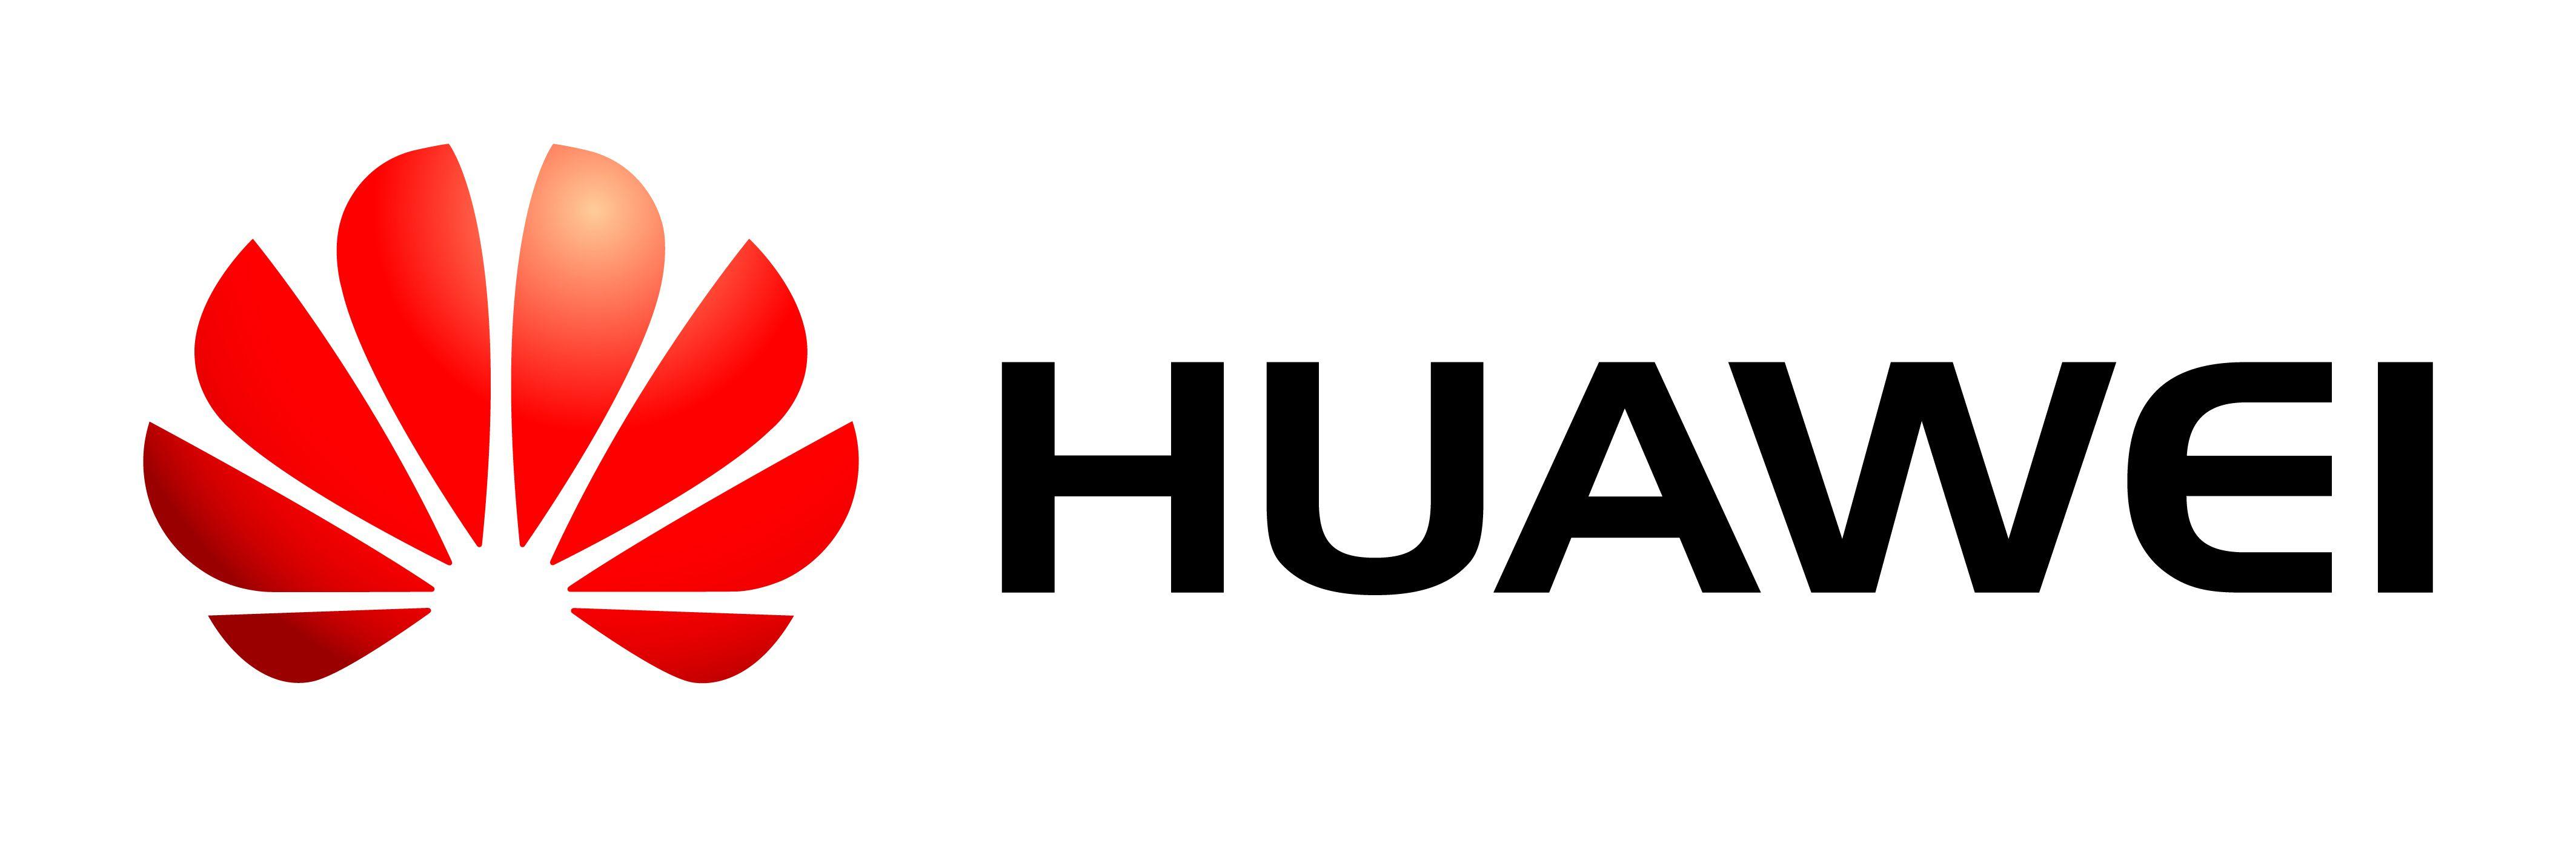 https://phone-station.com/category/huawei-166_173